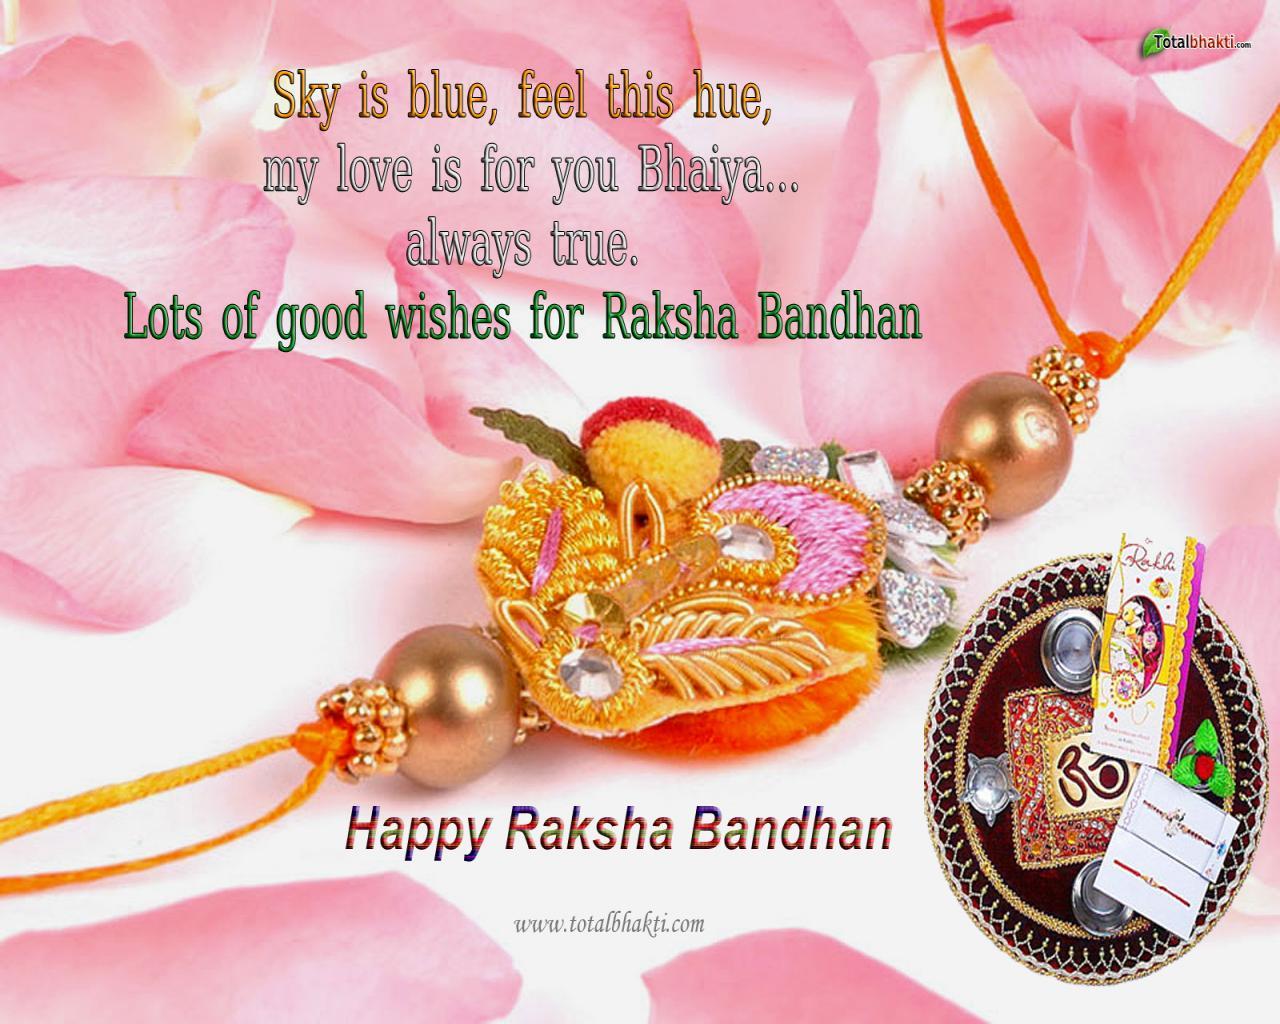 Calendar Raksha Bandhan : Wallpaper world raksha bandhan